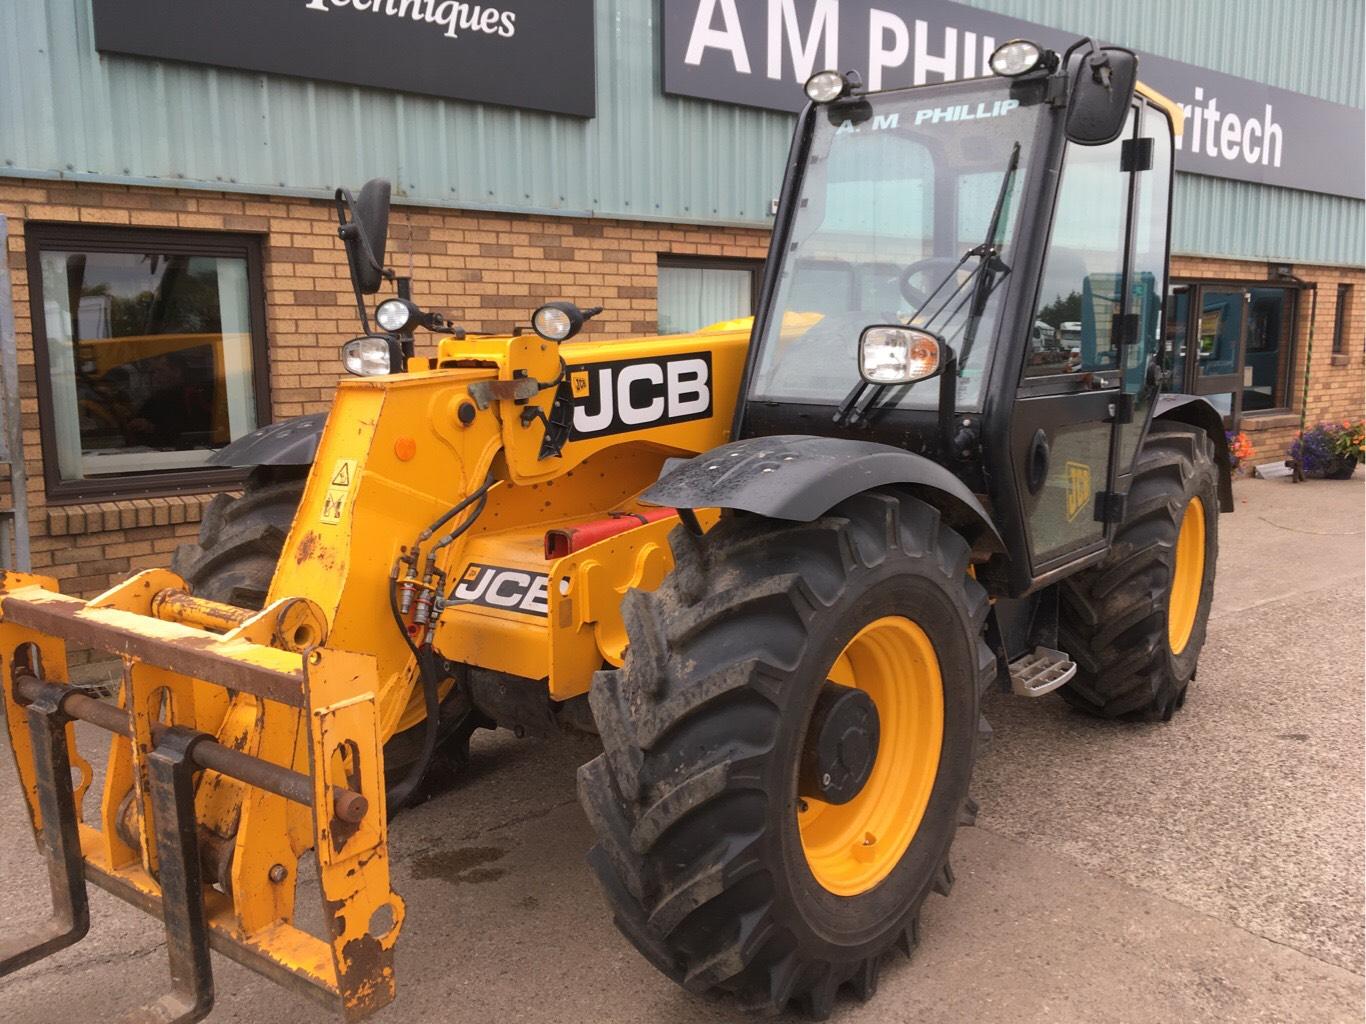 Used Machinery | Used Heavy Equipment | Scot JCB